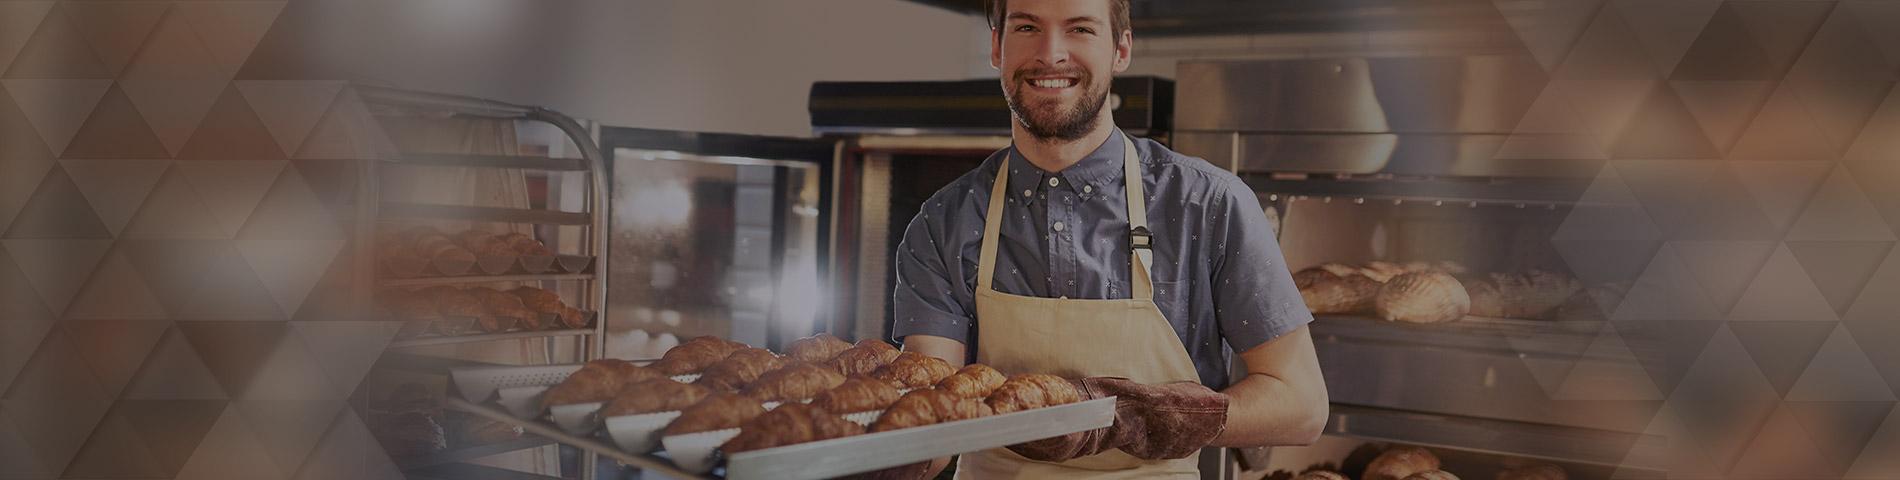 Bakery Equipment Leaders